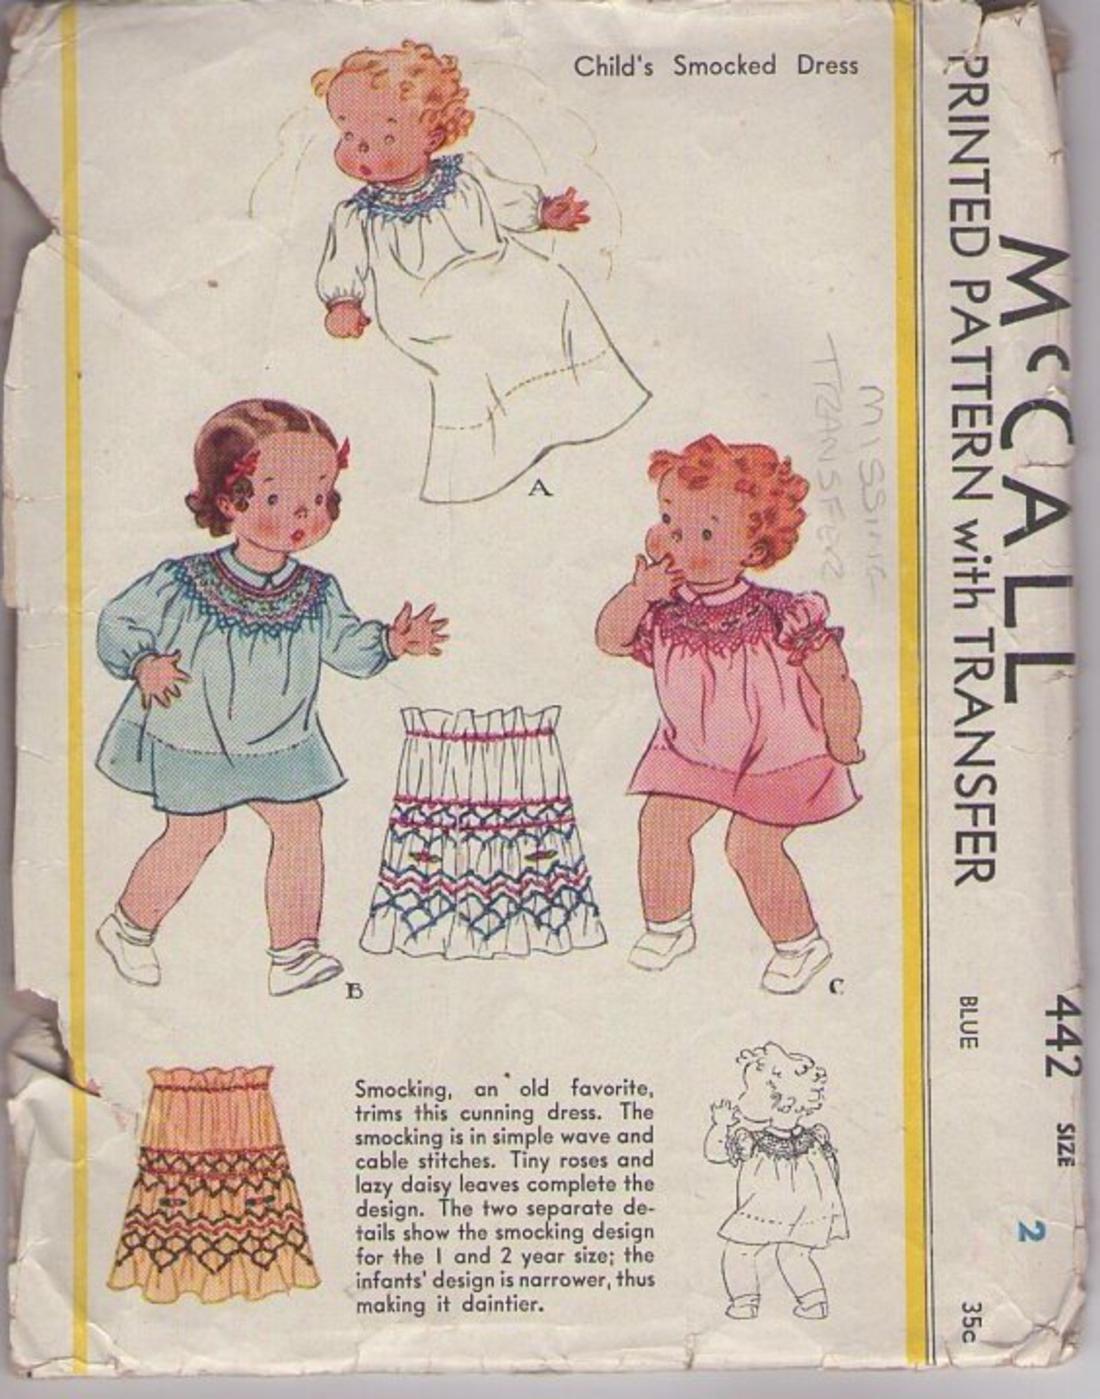 cf0fbd672 MOMSPatterns Vintage Sewing Patterns - McCall's 442 Vintage 30's Sewing  Pattern PRECIOUS Toddler Girls' Smocked Dress in 2 Styles & Bunting Gown,  Smocking ...